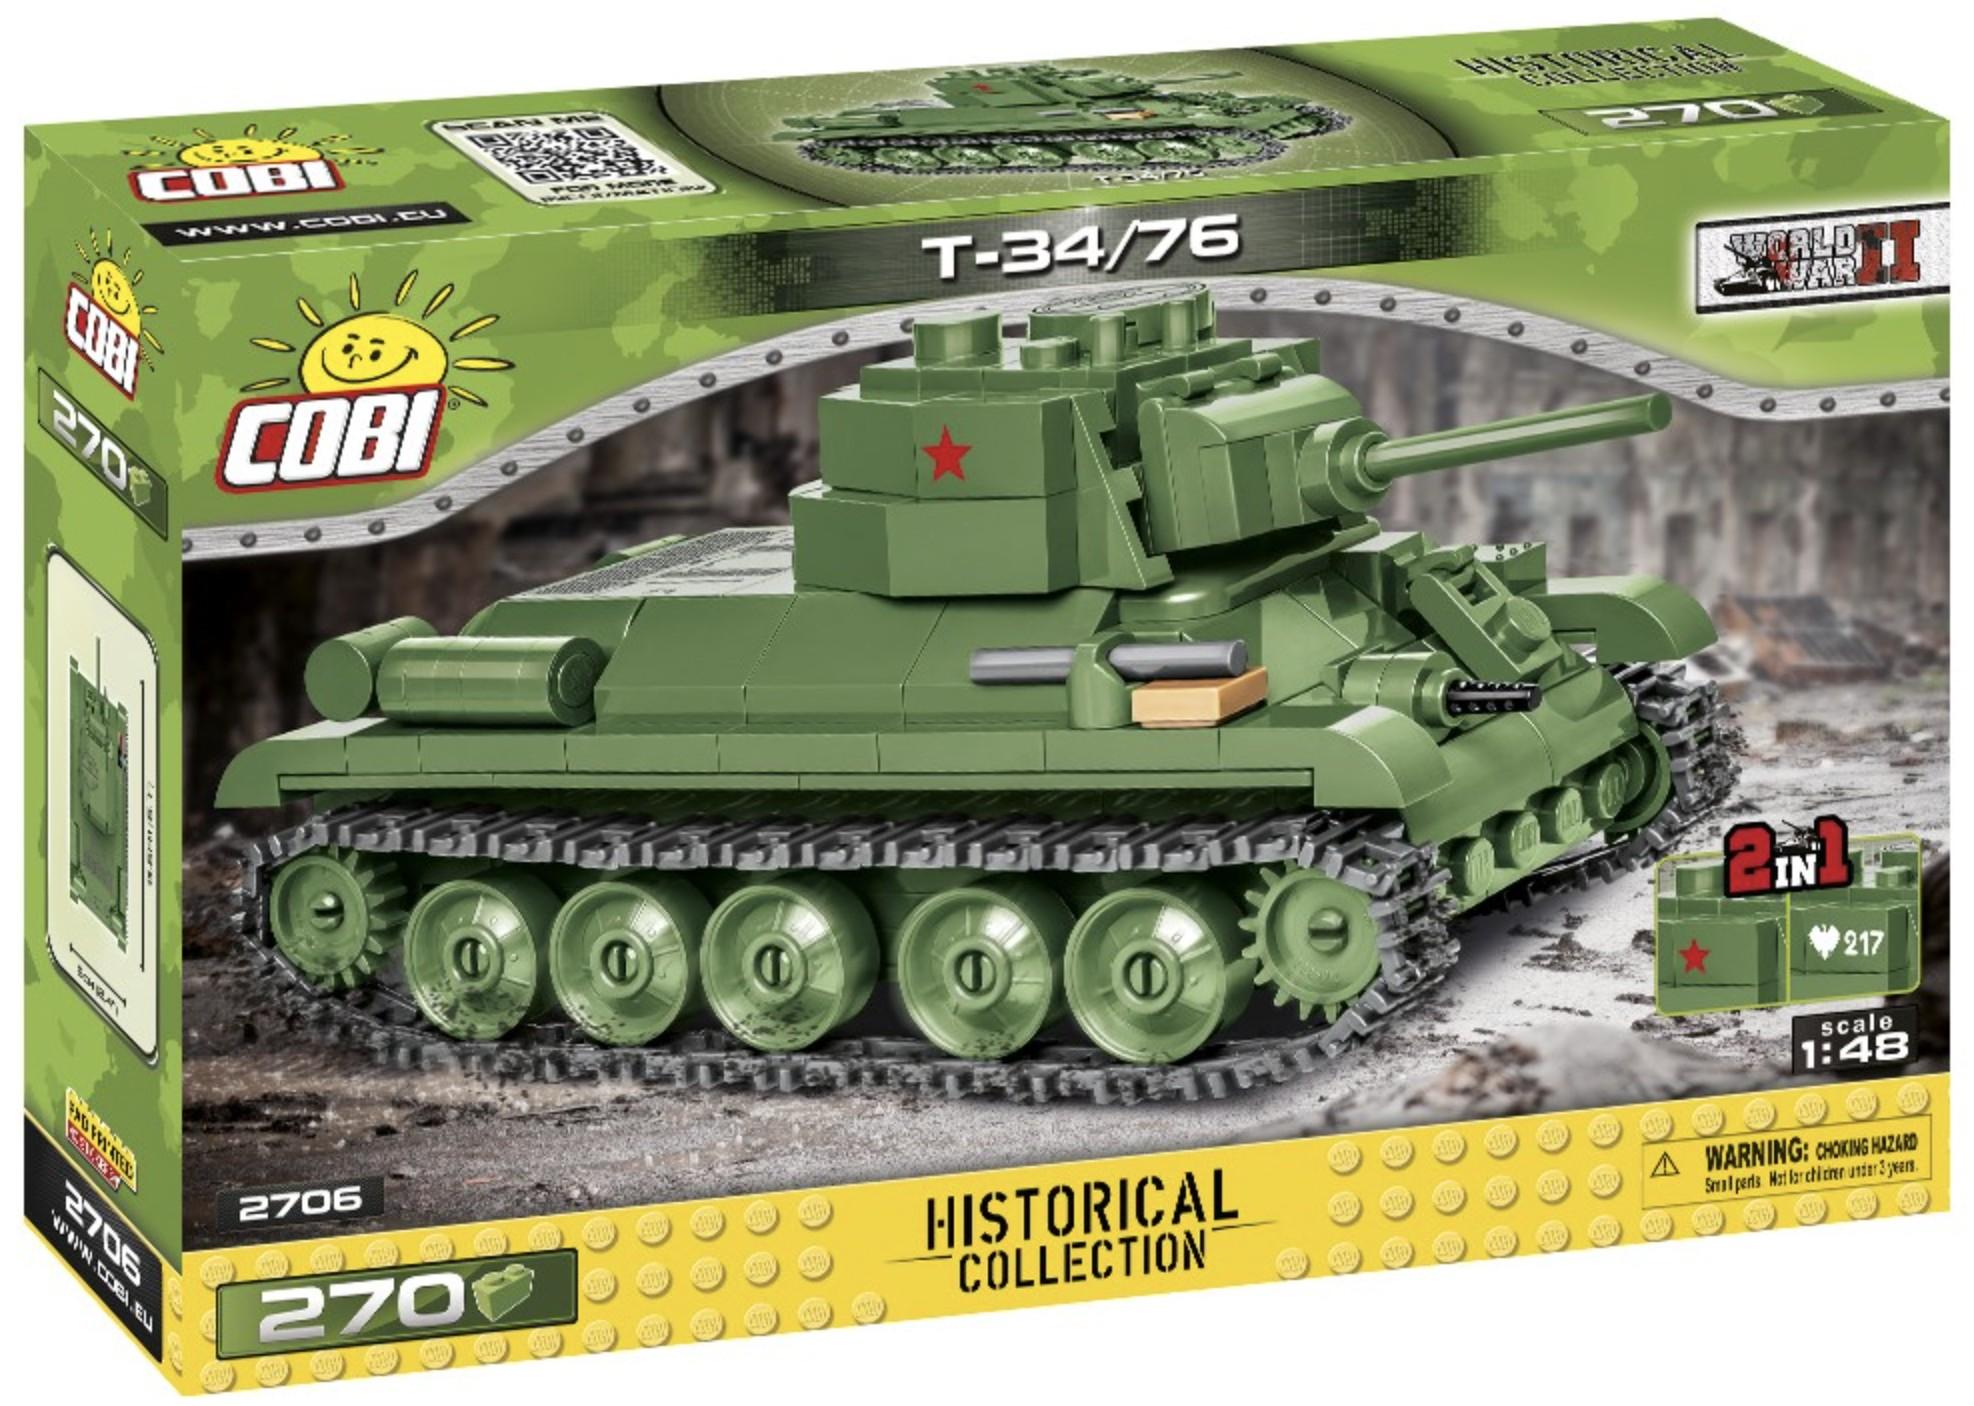 2706 - T-34/76